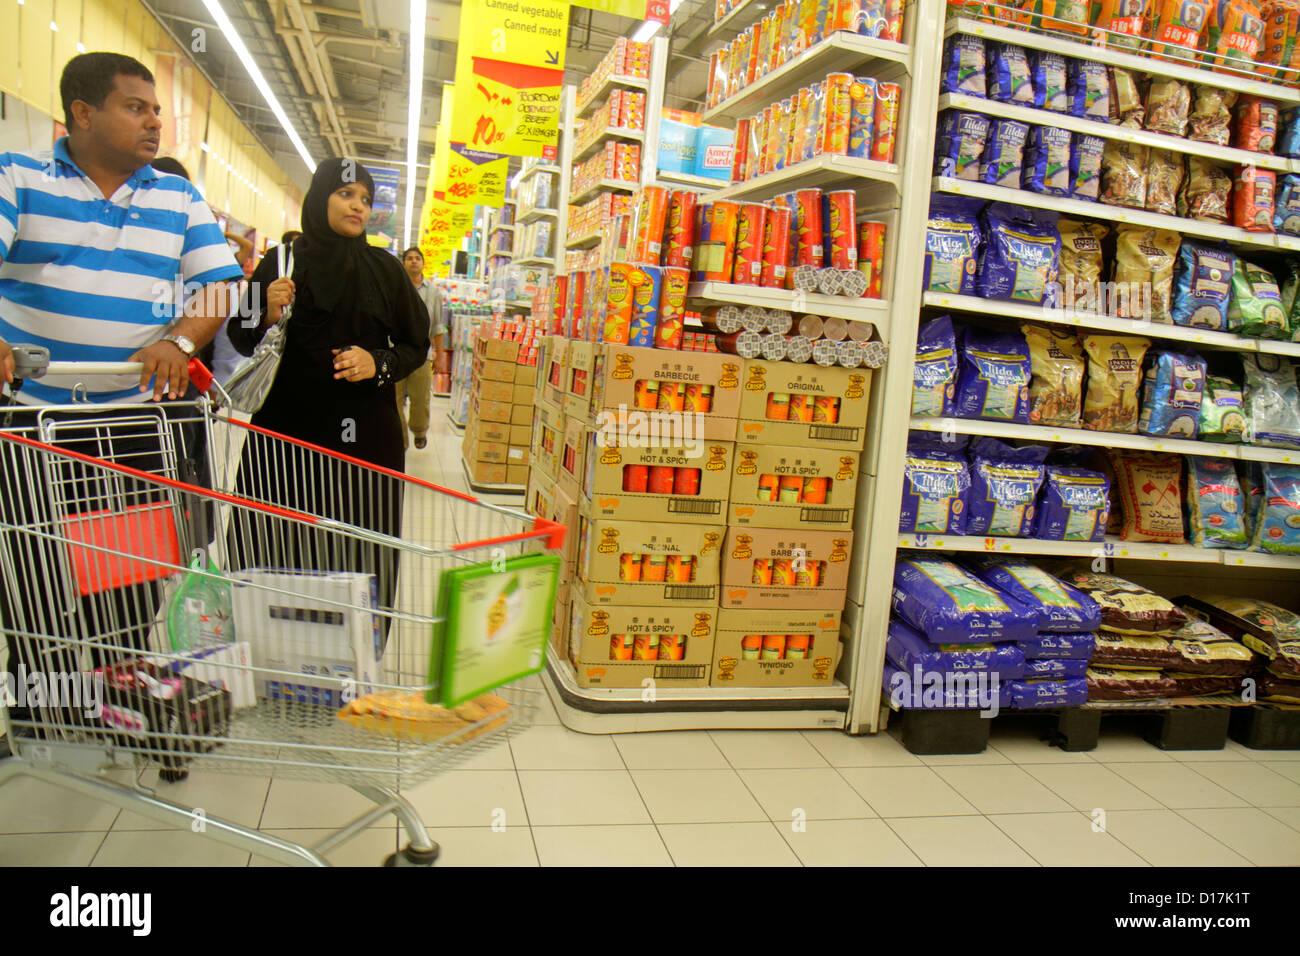 Dubai UAE United Arab Emirates U.A.E. Middle East Al Souqe Al Kabeer Carrefour Hyper Market shopping grocery store Stock Photo